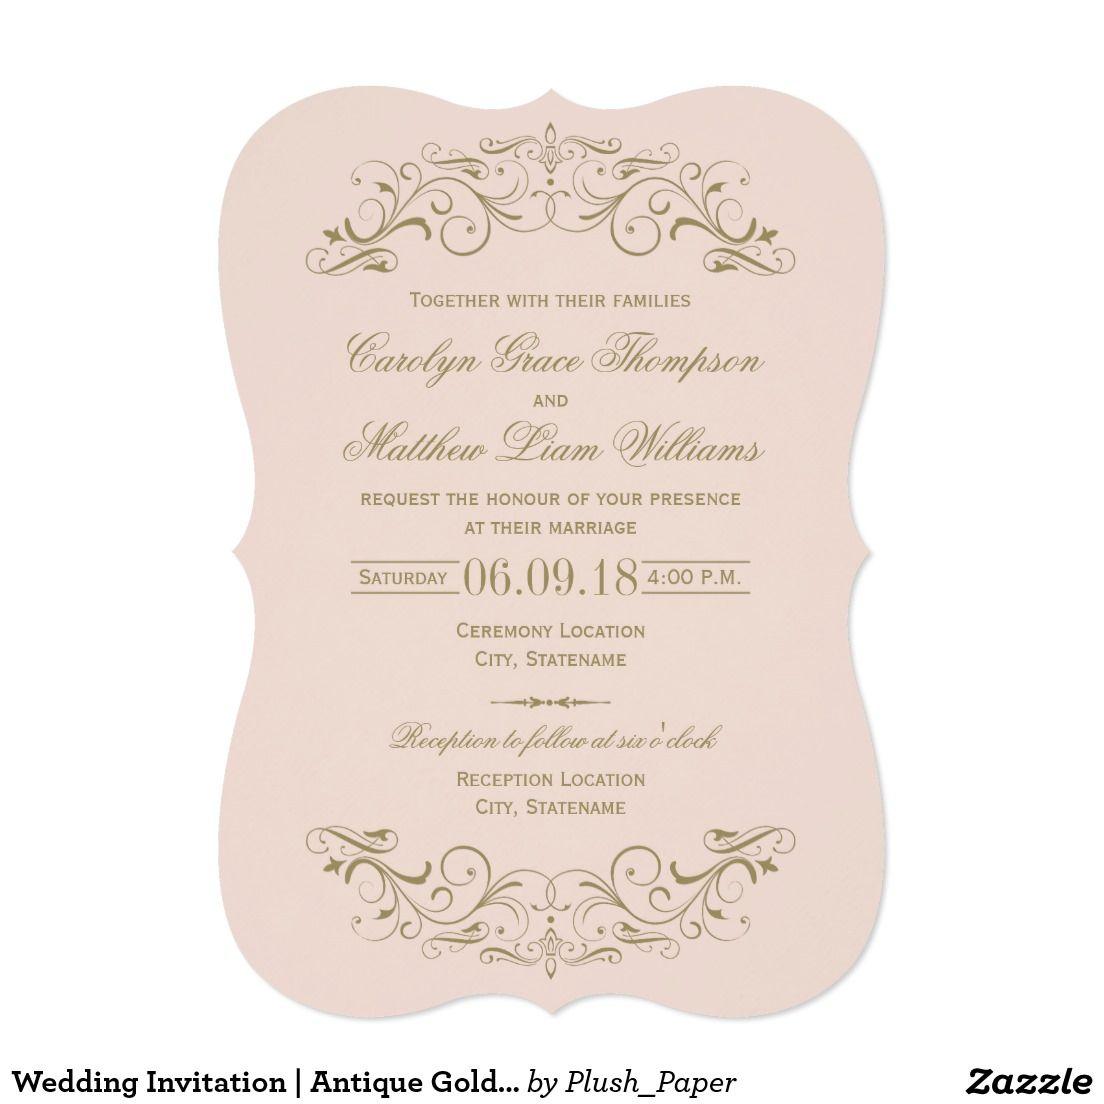 Wedding Invitation | Antique Gold Flourish | Gold Wedding ...